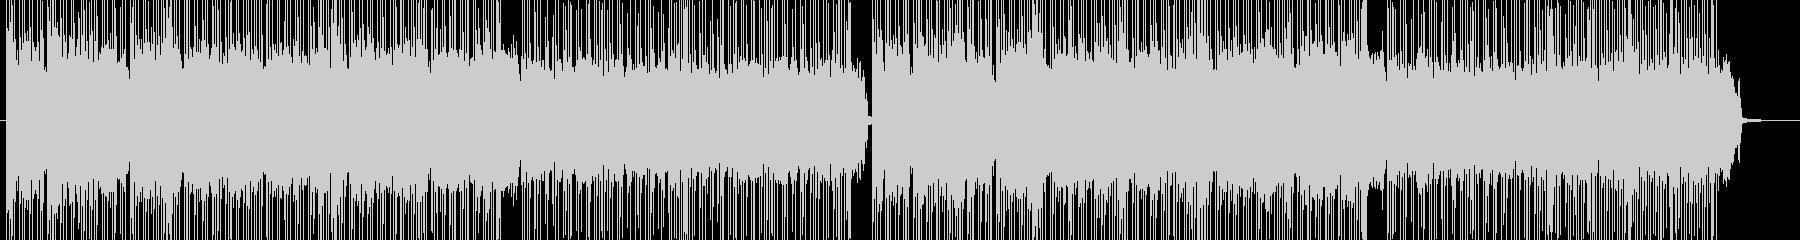 「HR/HM」「ROCK」BGM114の未再生の波形